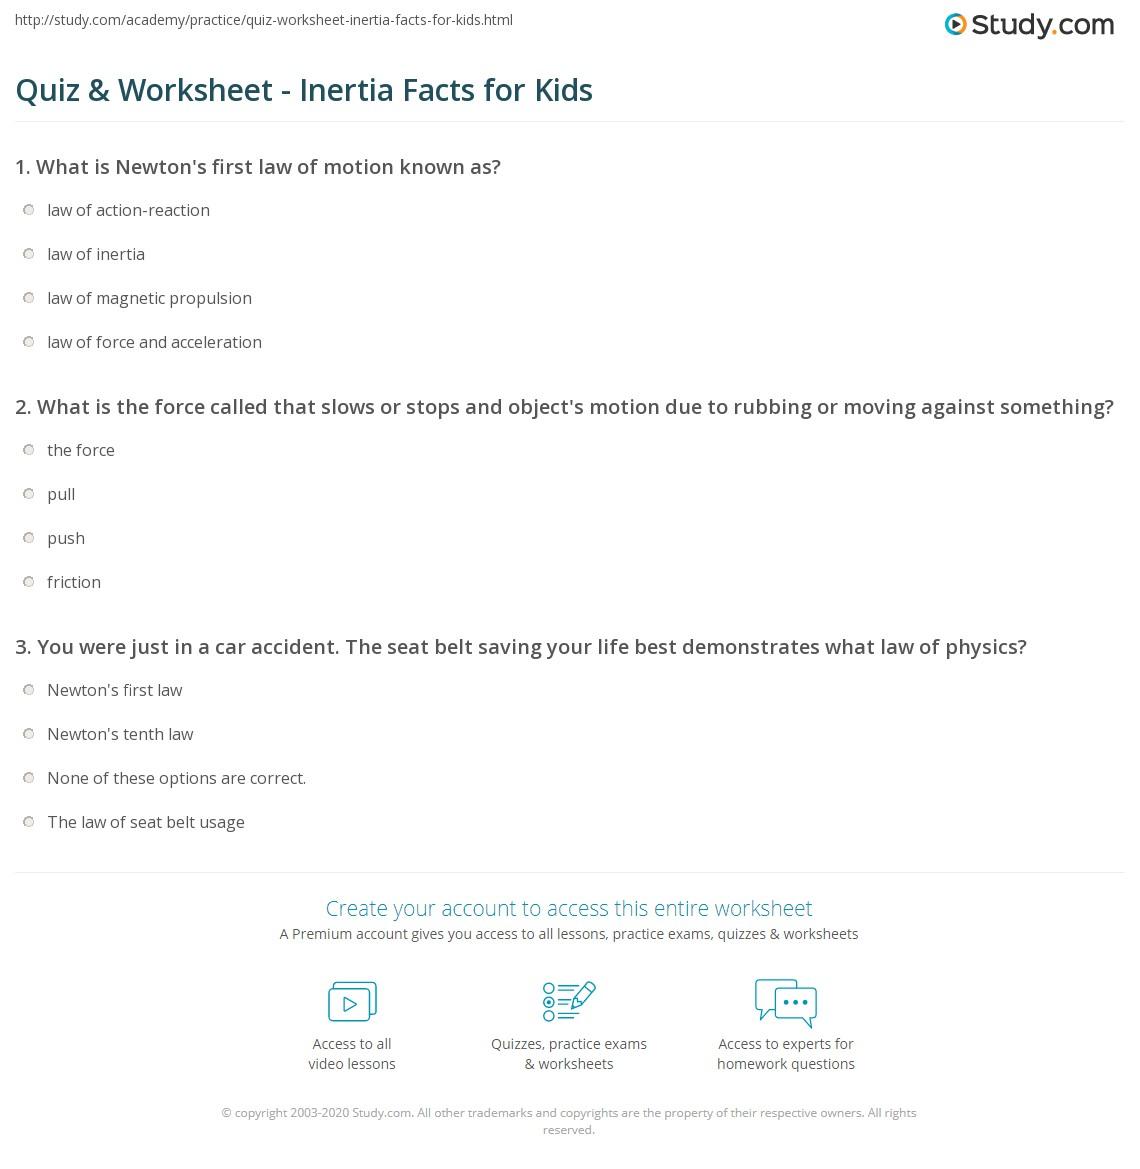 Quiz Worksheet Inertia Facts For Kids Study